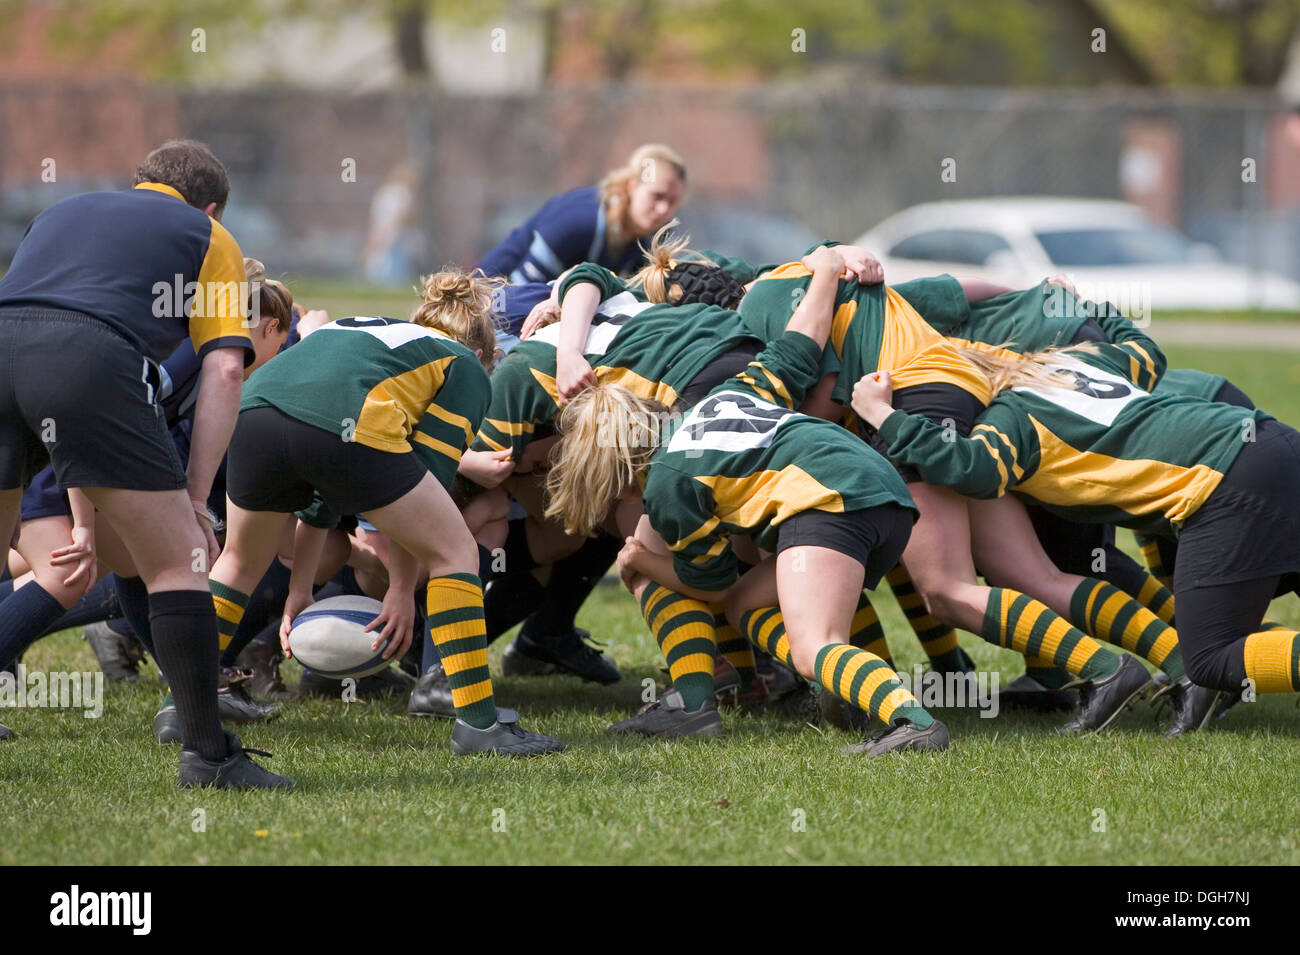 Le ragazze in rugby scrum Immagini Stock